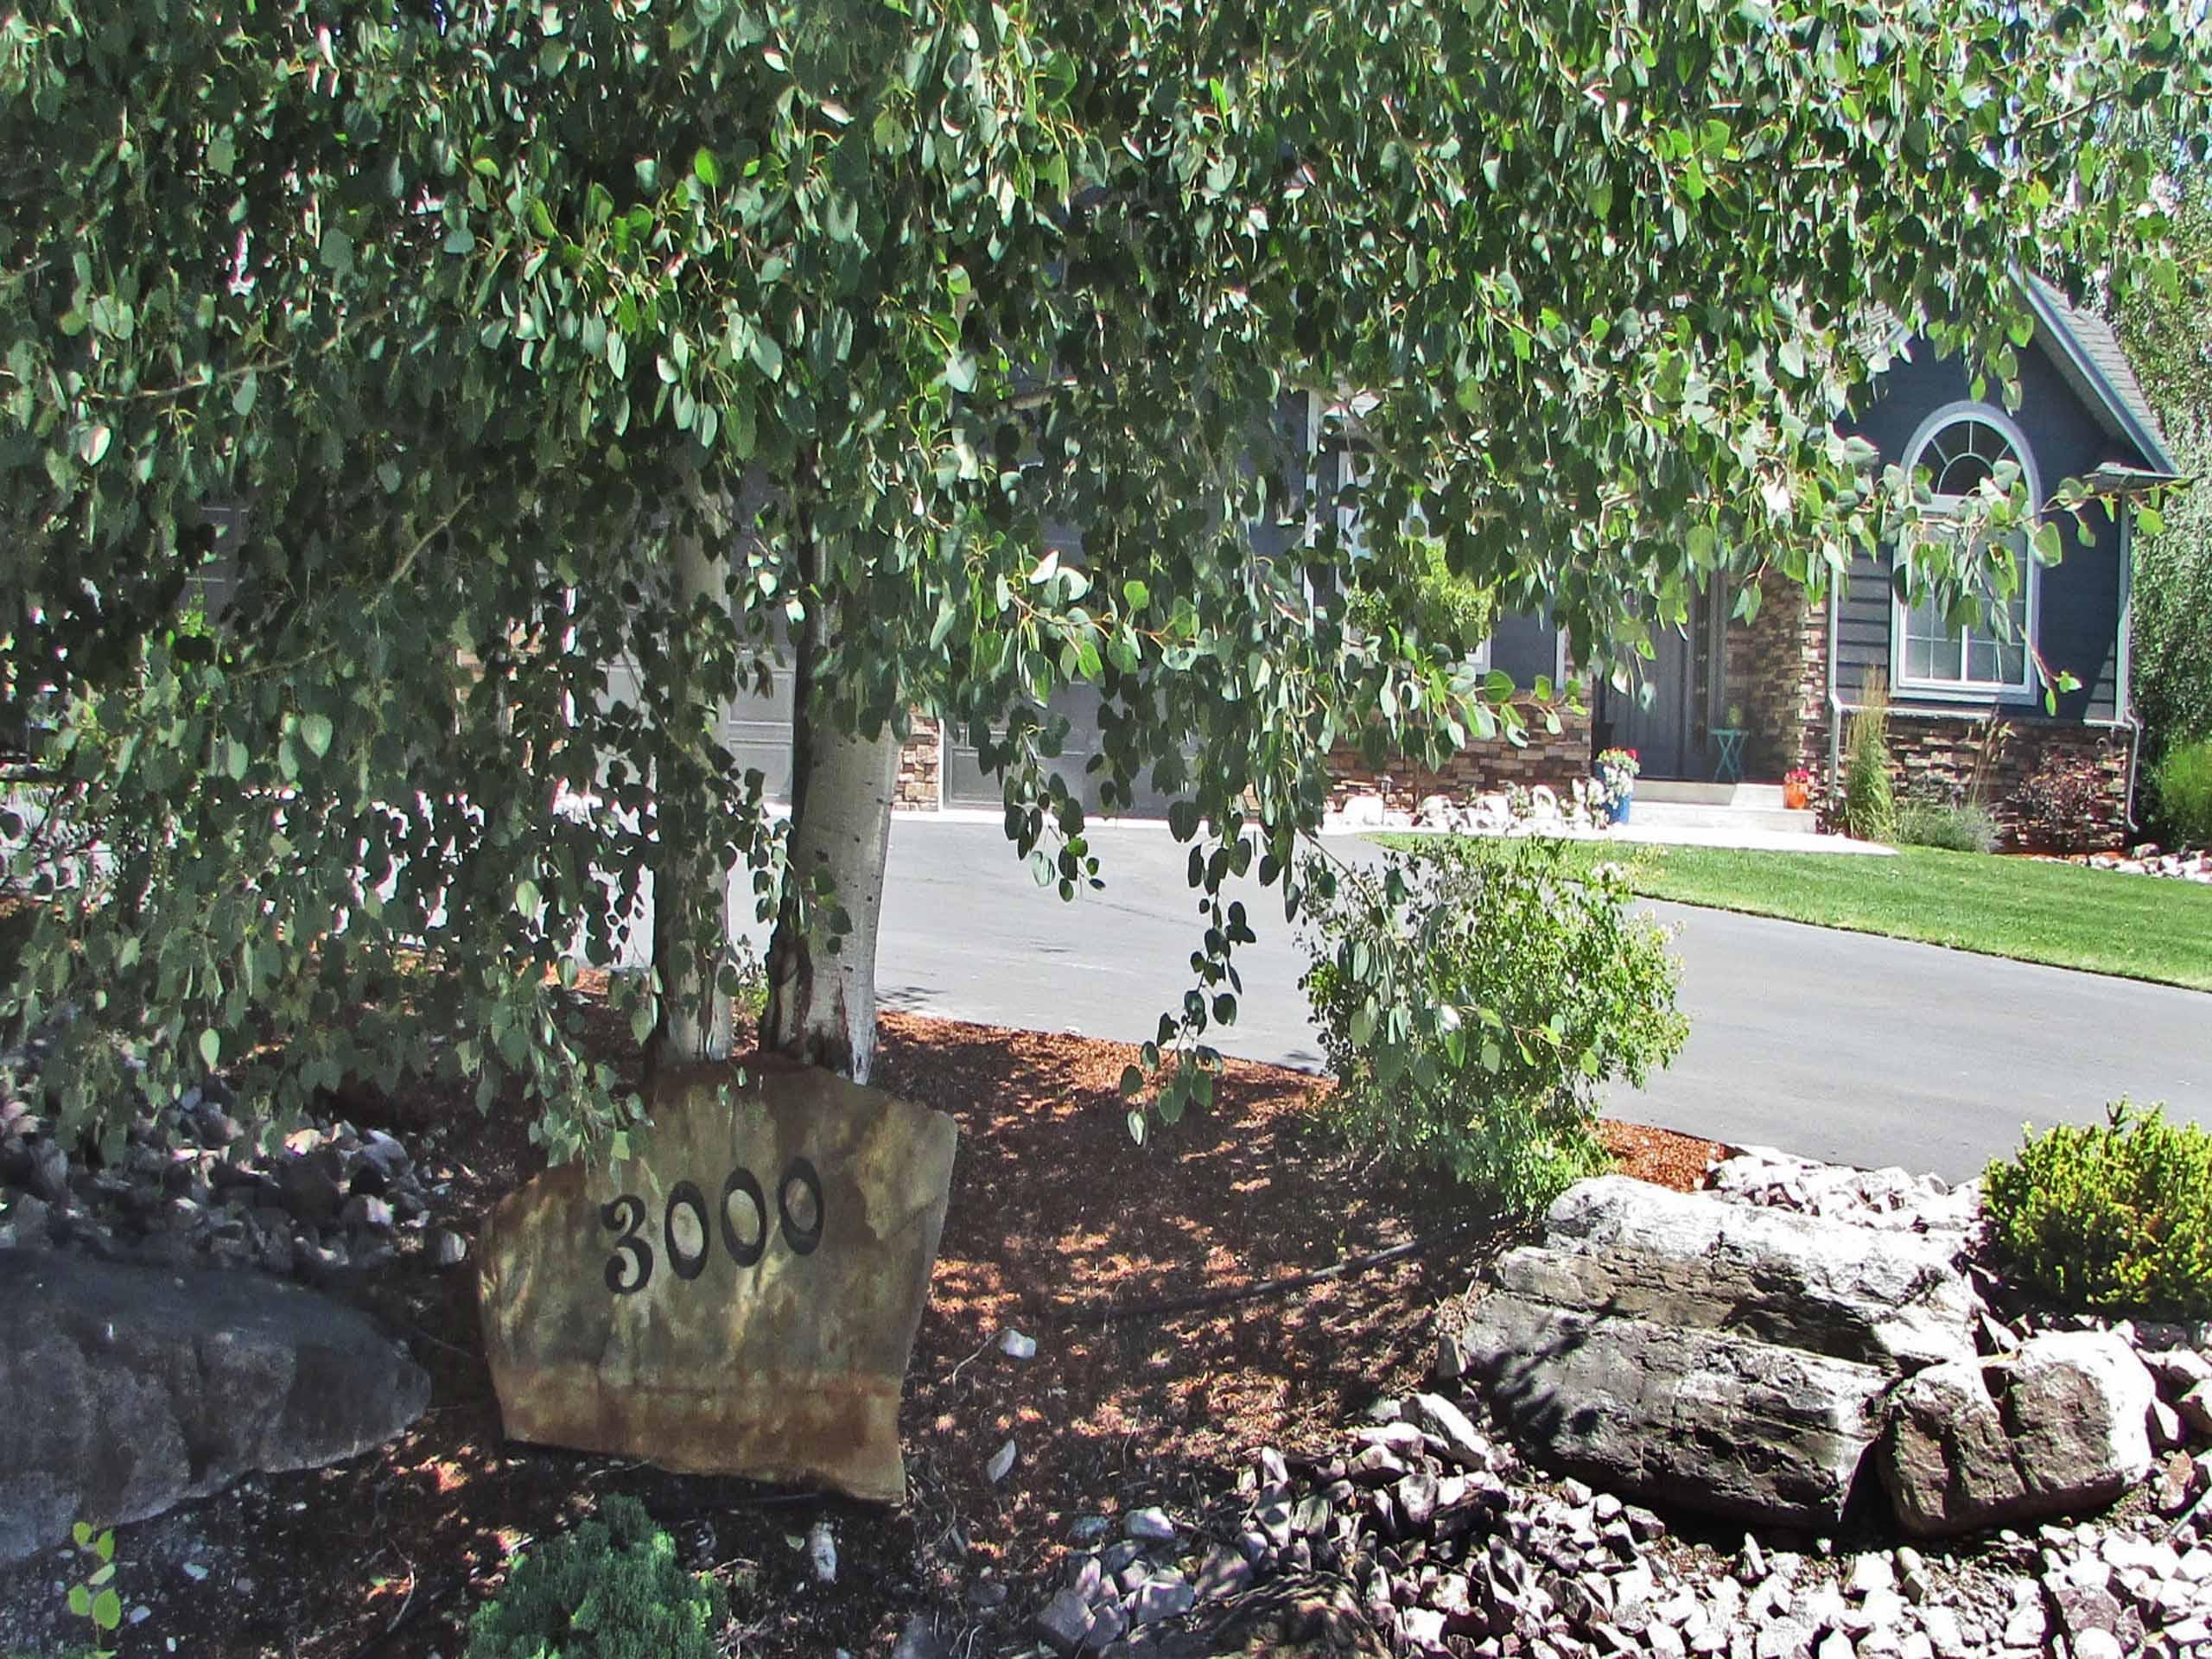 3000 Sandalwood Court, Missoula, MT 59804